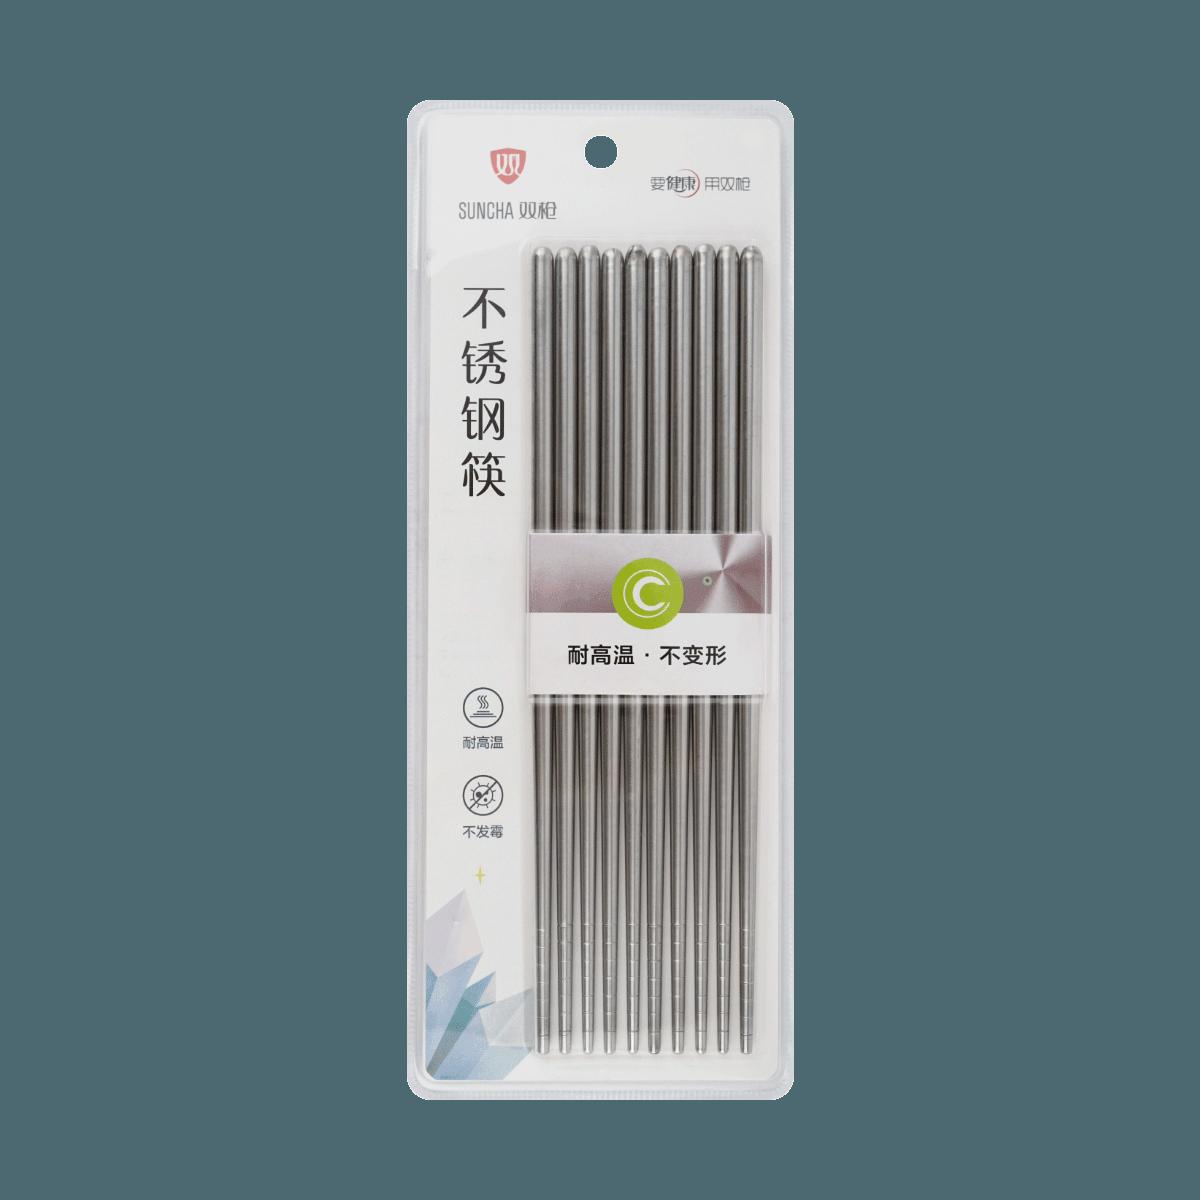 Yamibuy.com:Customer reviews:SUNCHA Slip Resistant Stainless Steel Chopsticks 5 Pairs